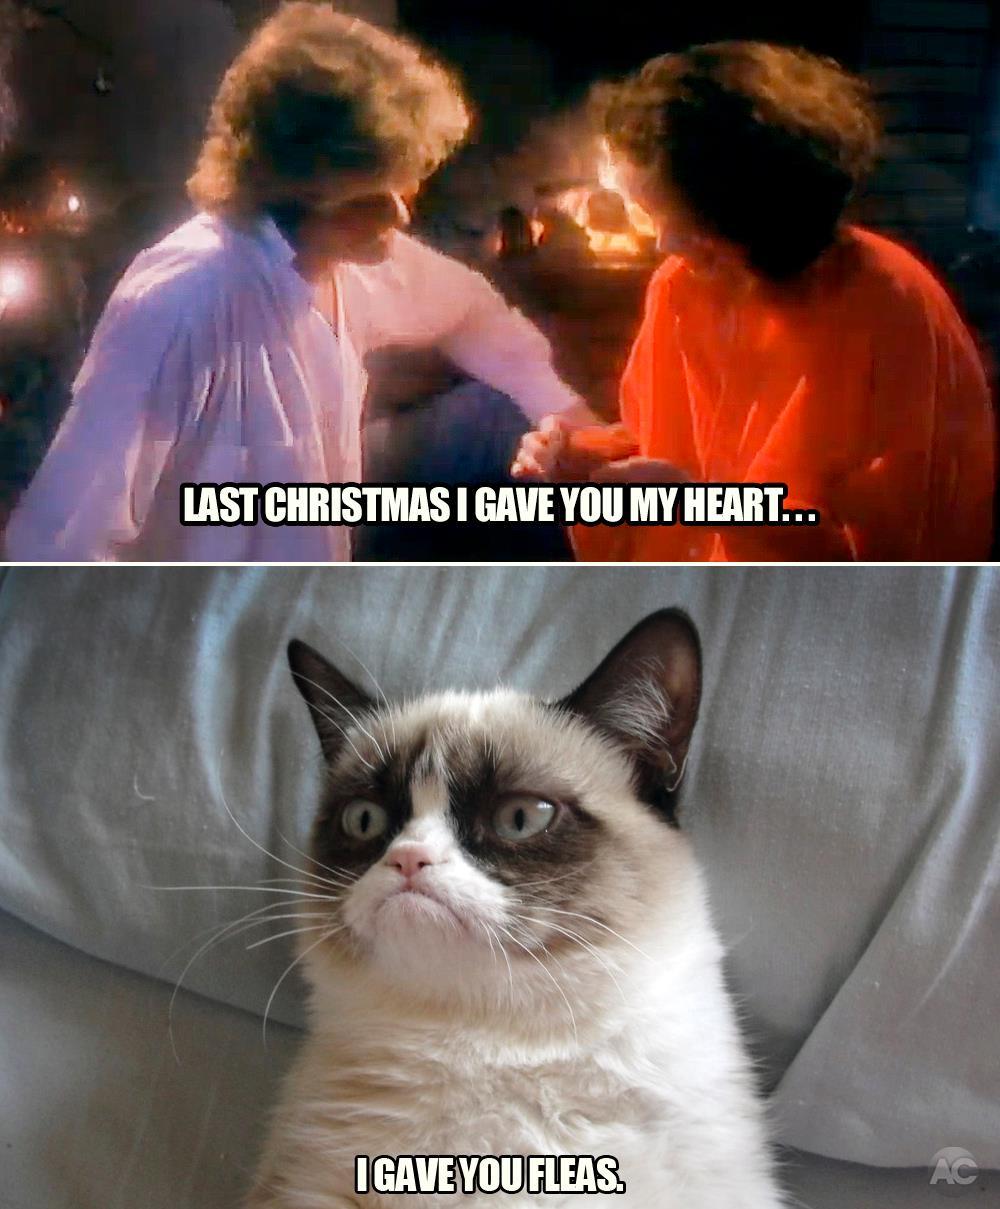 last christmas i gave you my heart gave youfleas - Last Christmas I Gave You My Heart